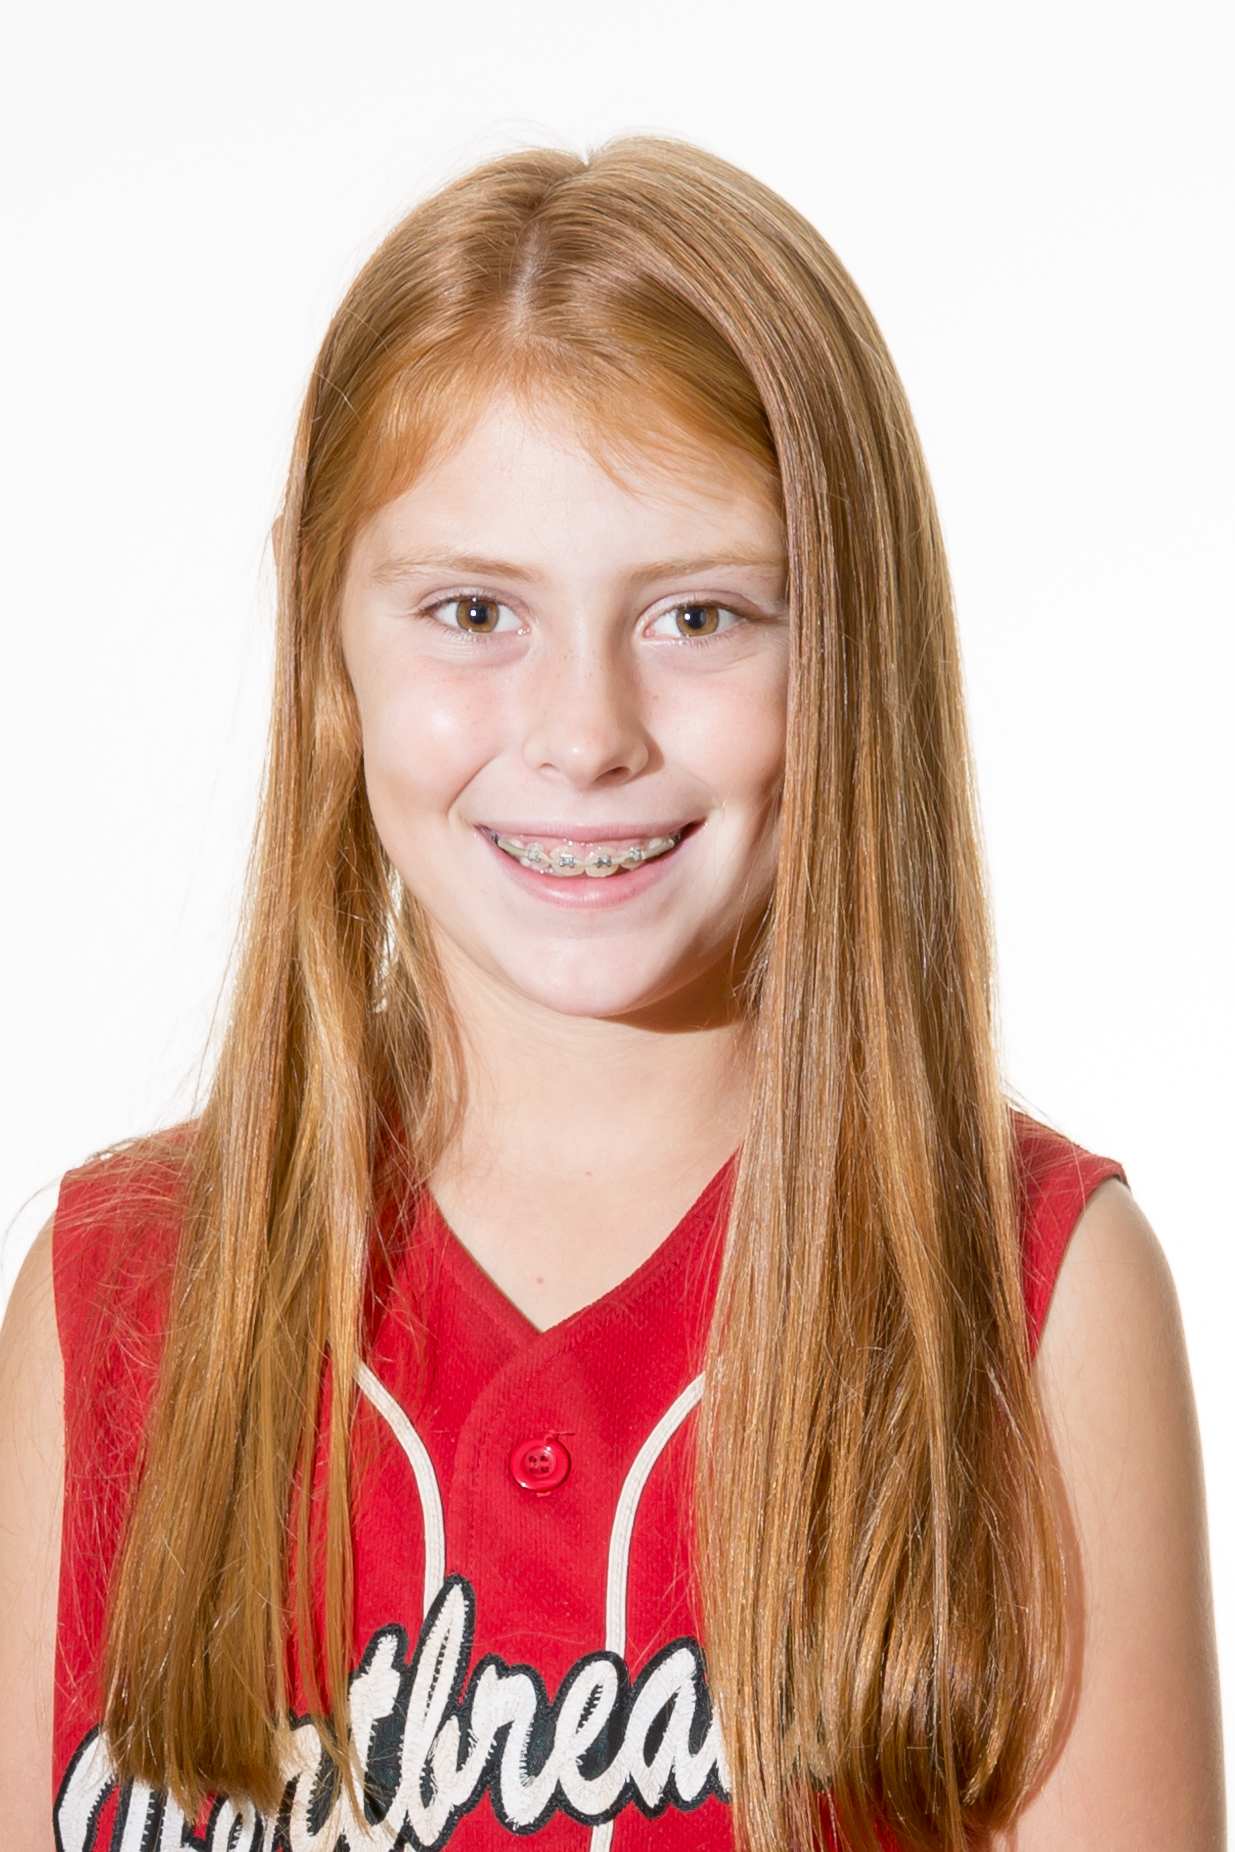 #8 Caitlin Hinkelman